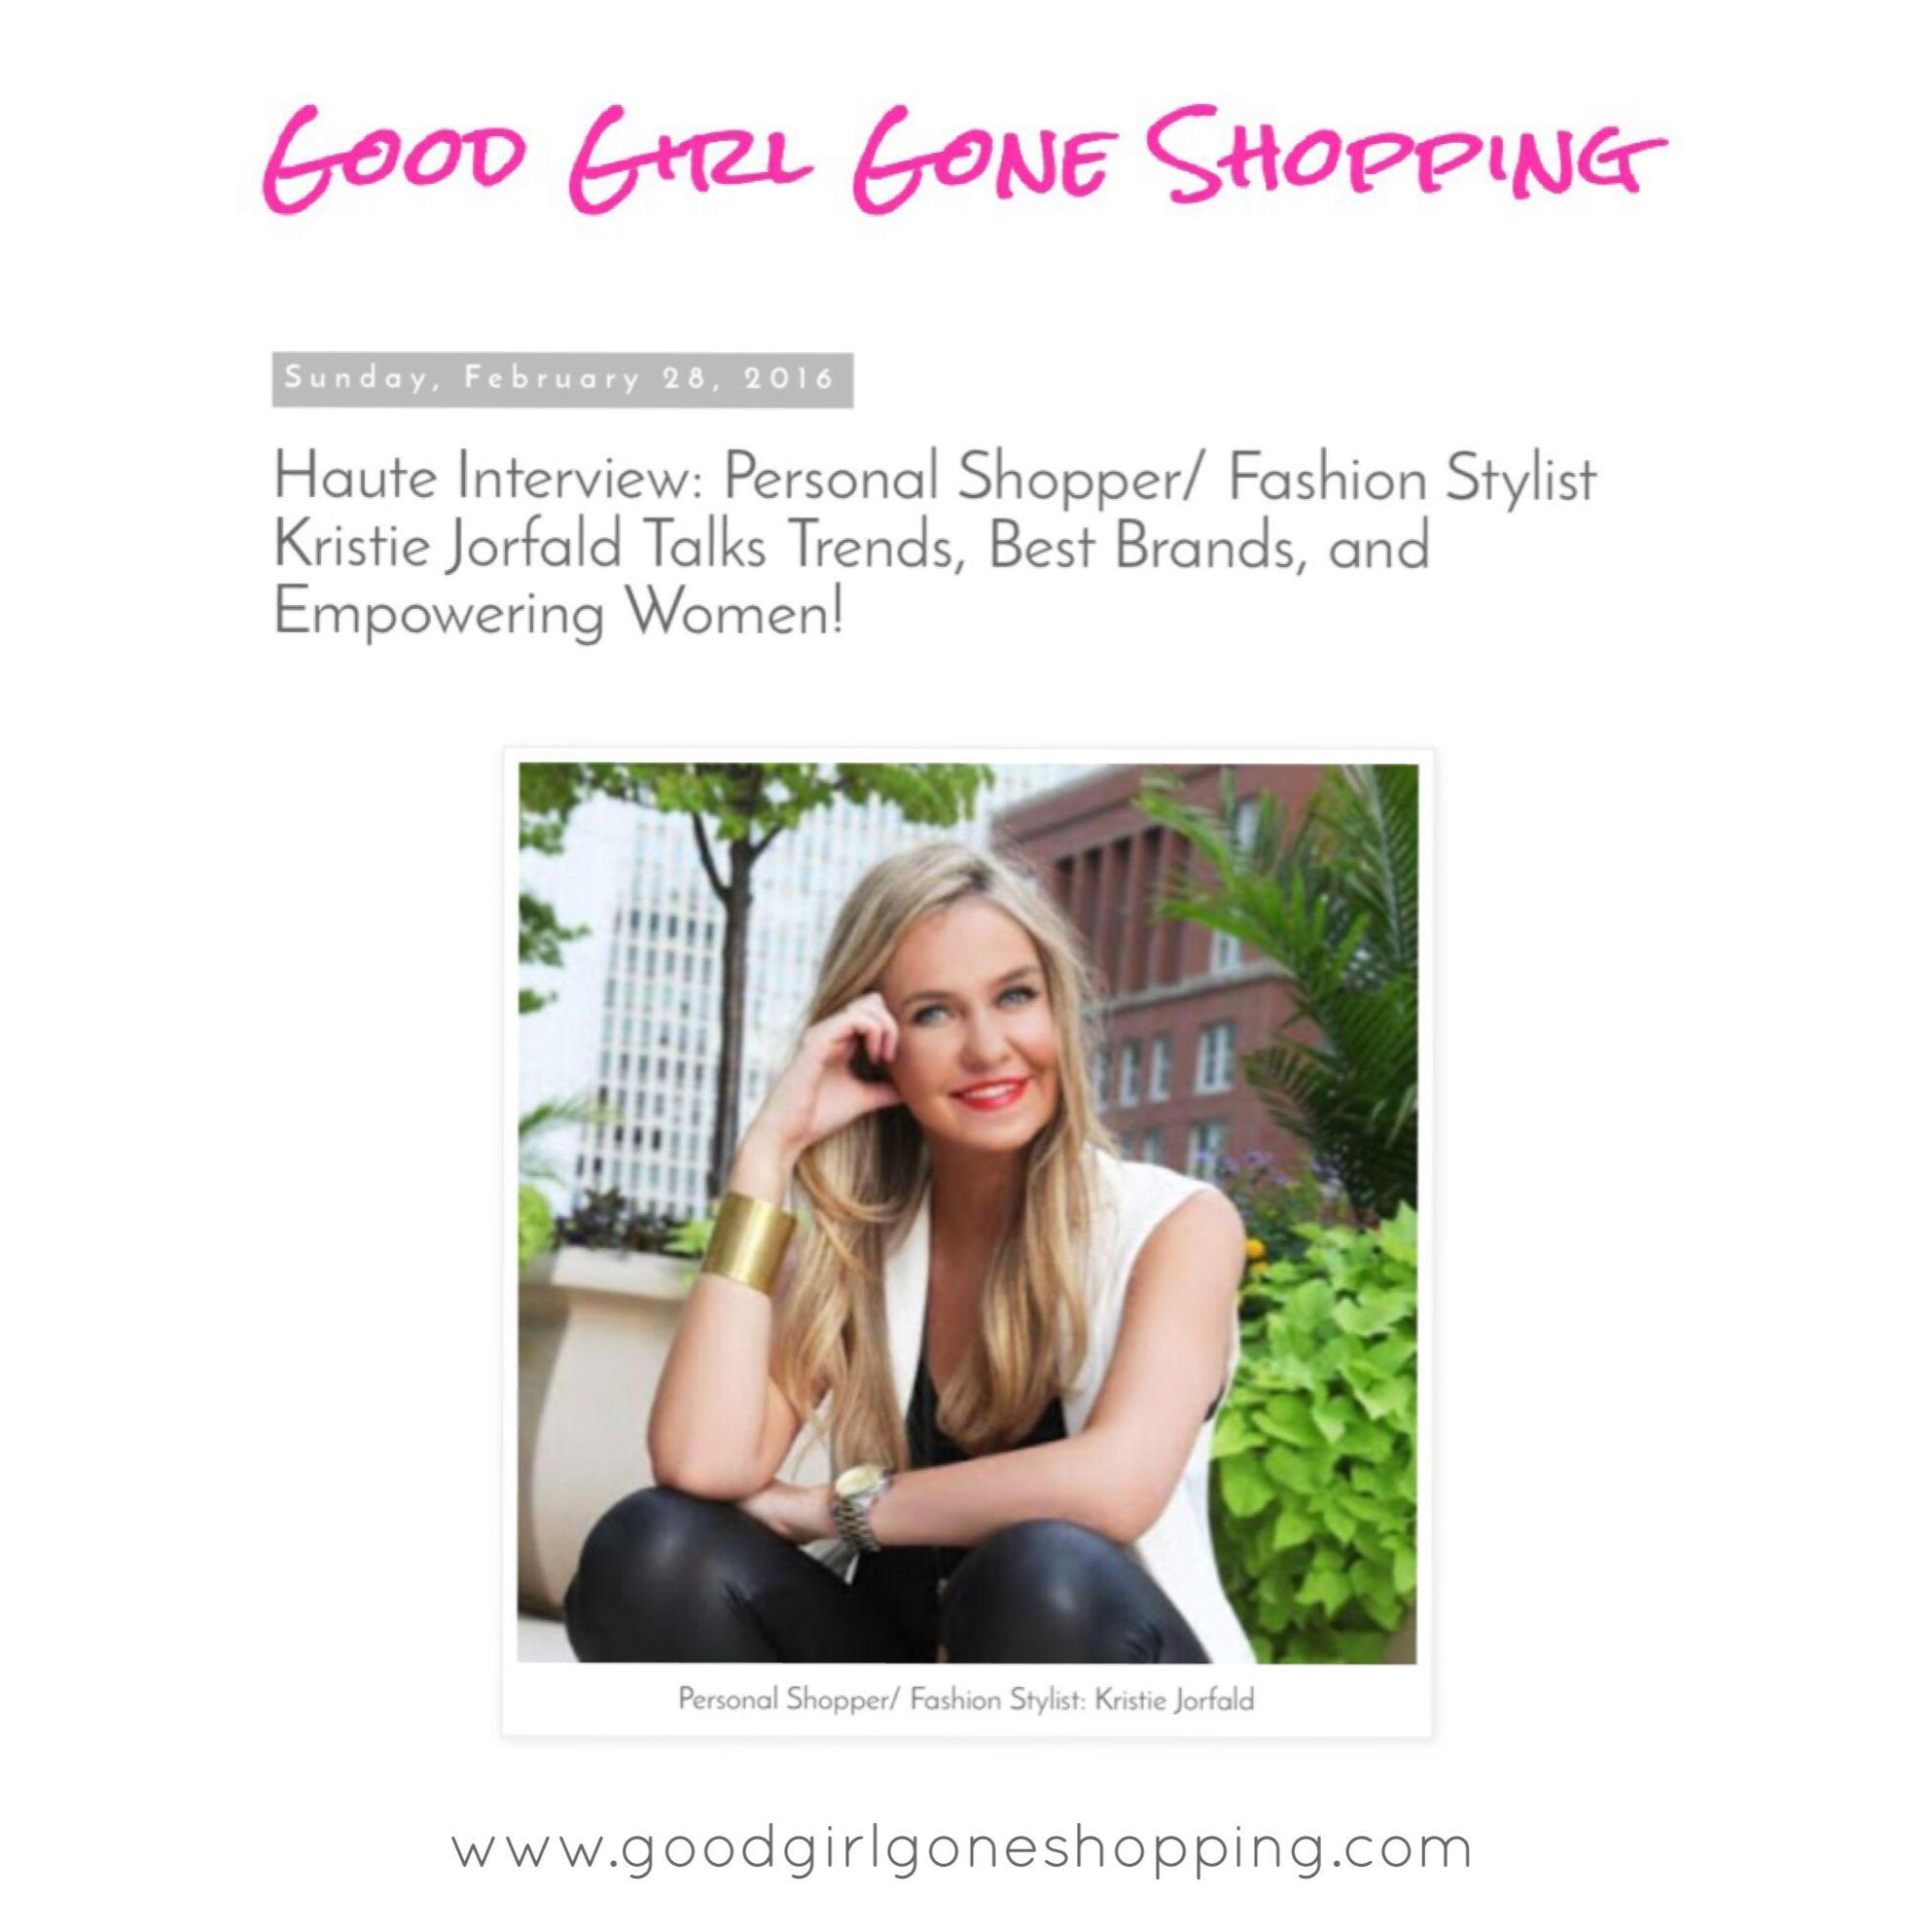 First Good Girl Gone Shopping interview of 2016 featured Kristie Jorfald -- personal shopper/ fashion stylist on www.goodgirlgoneshopping.com